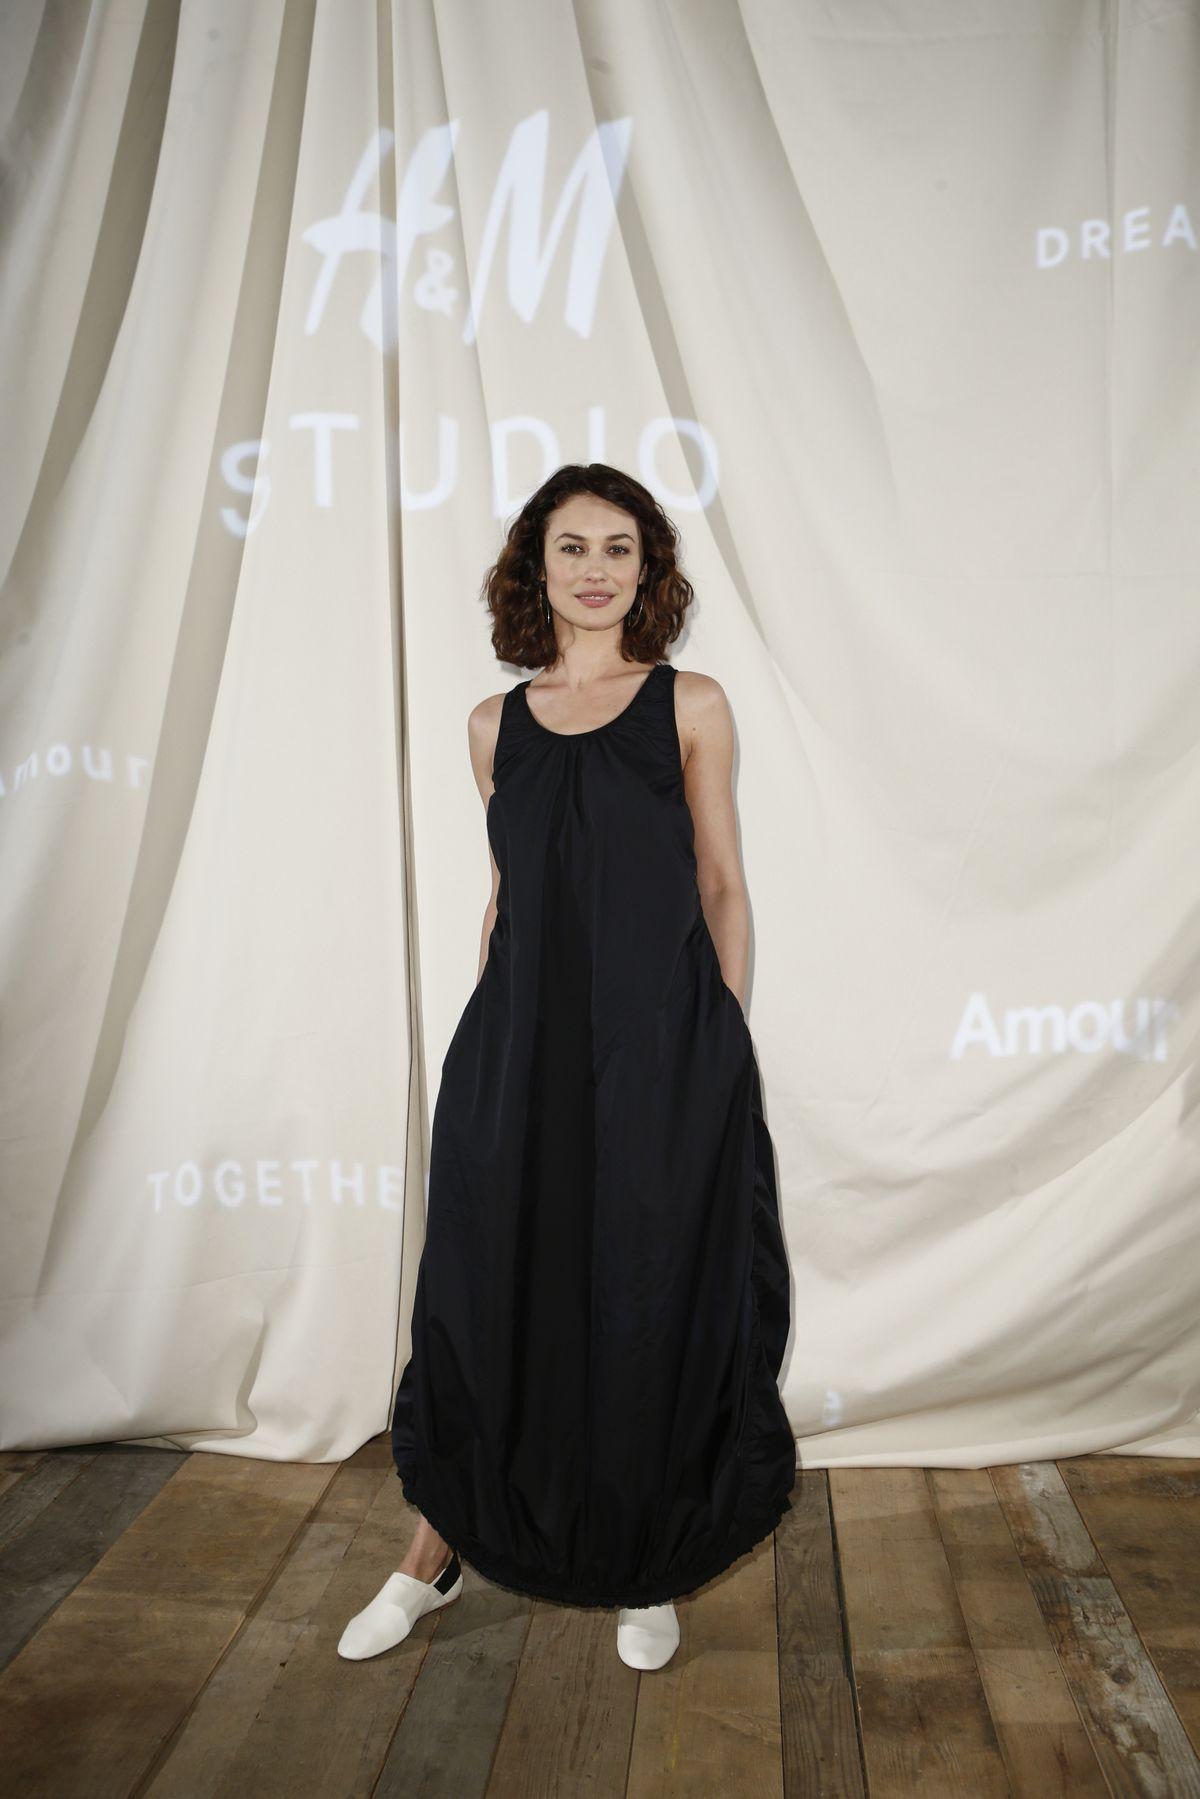 Herečka Olga Kurylenko patrila medzi pozvaných...